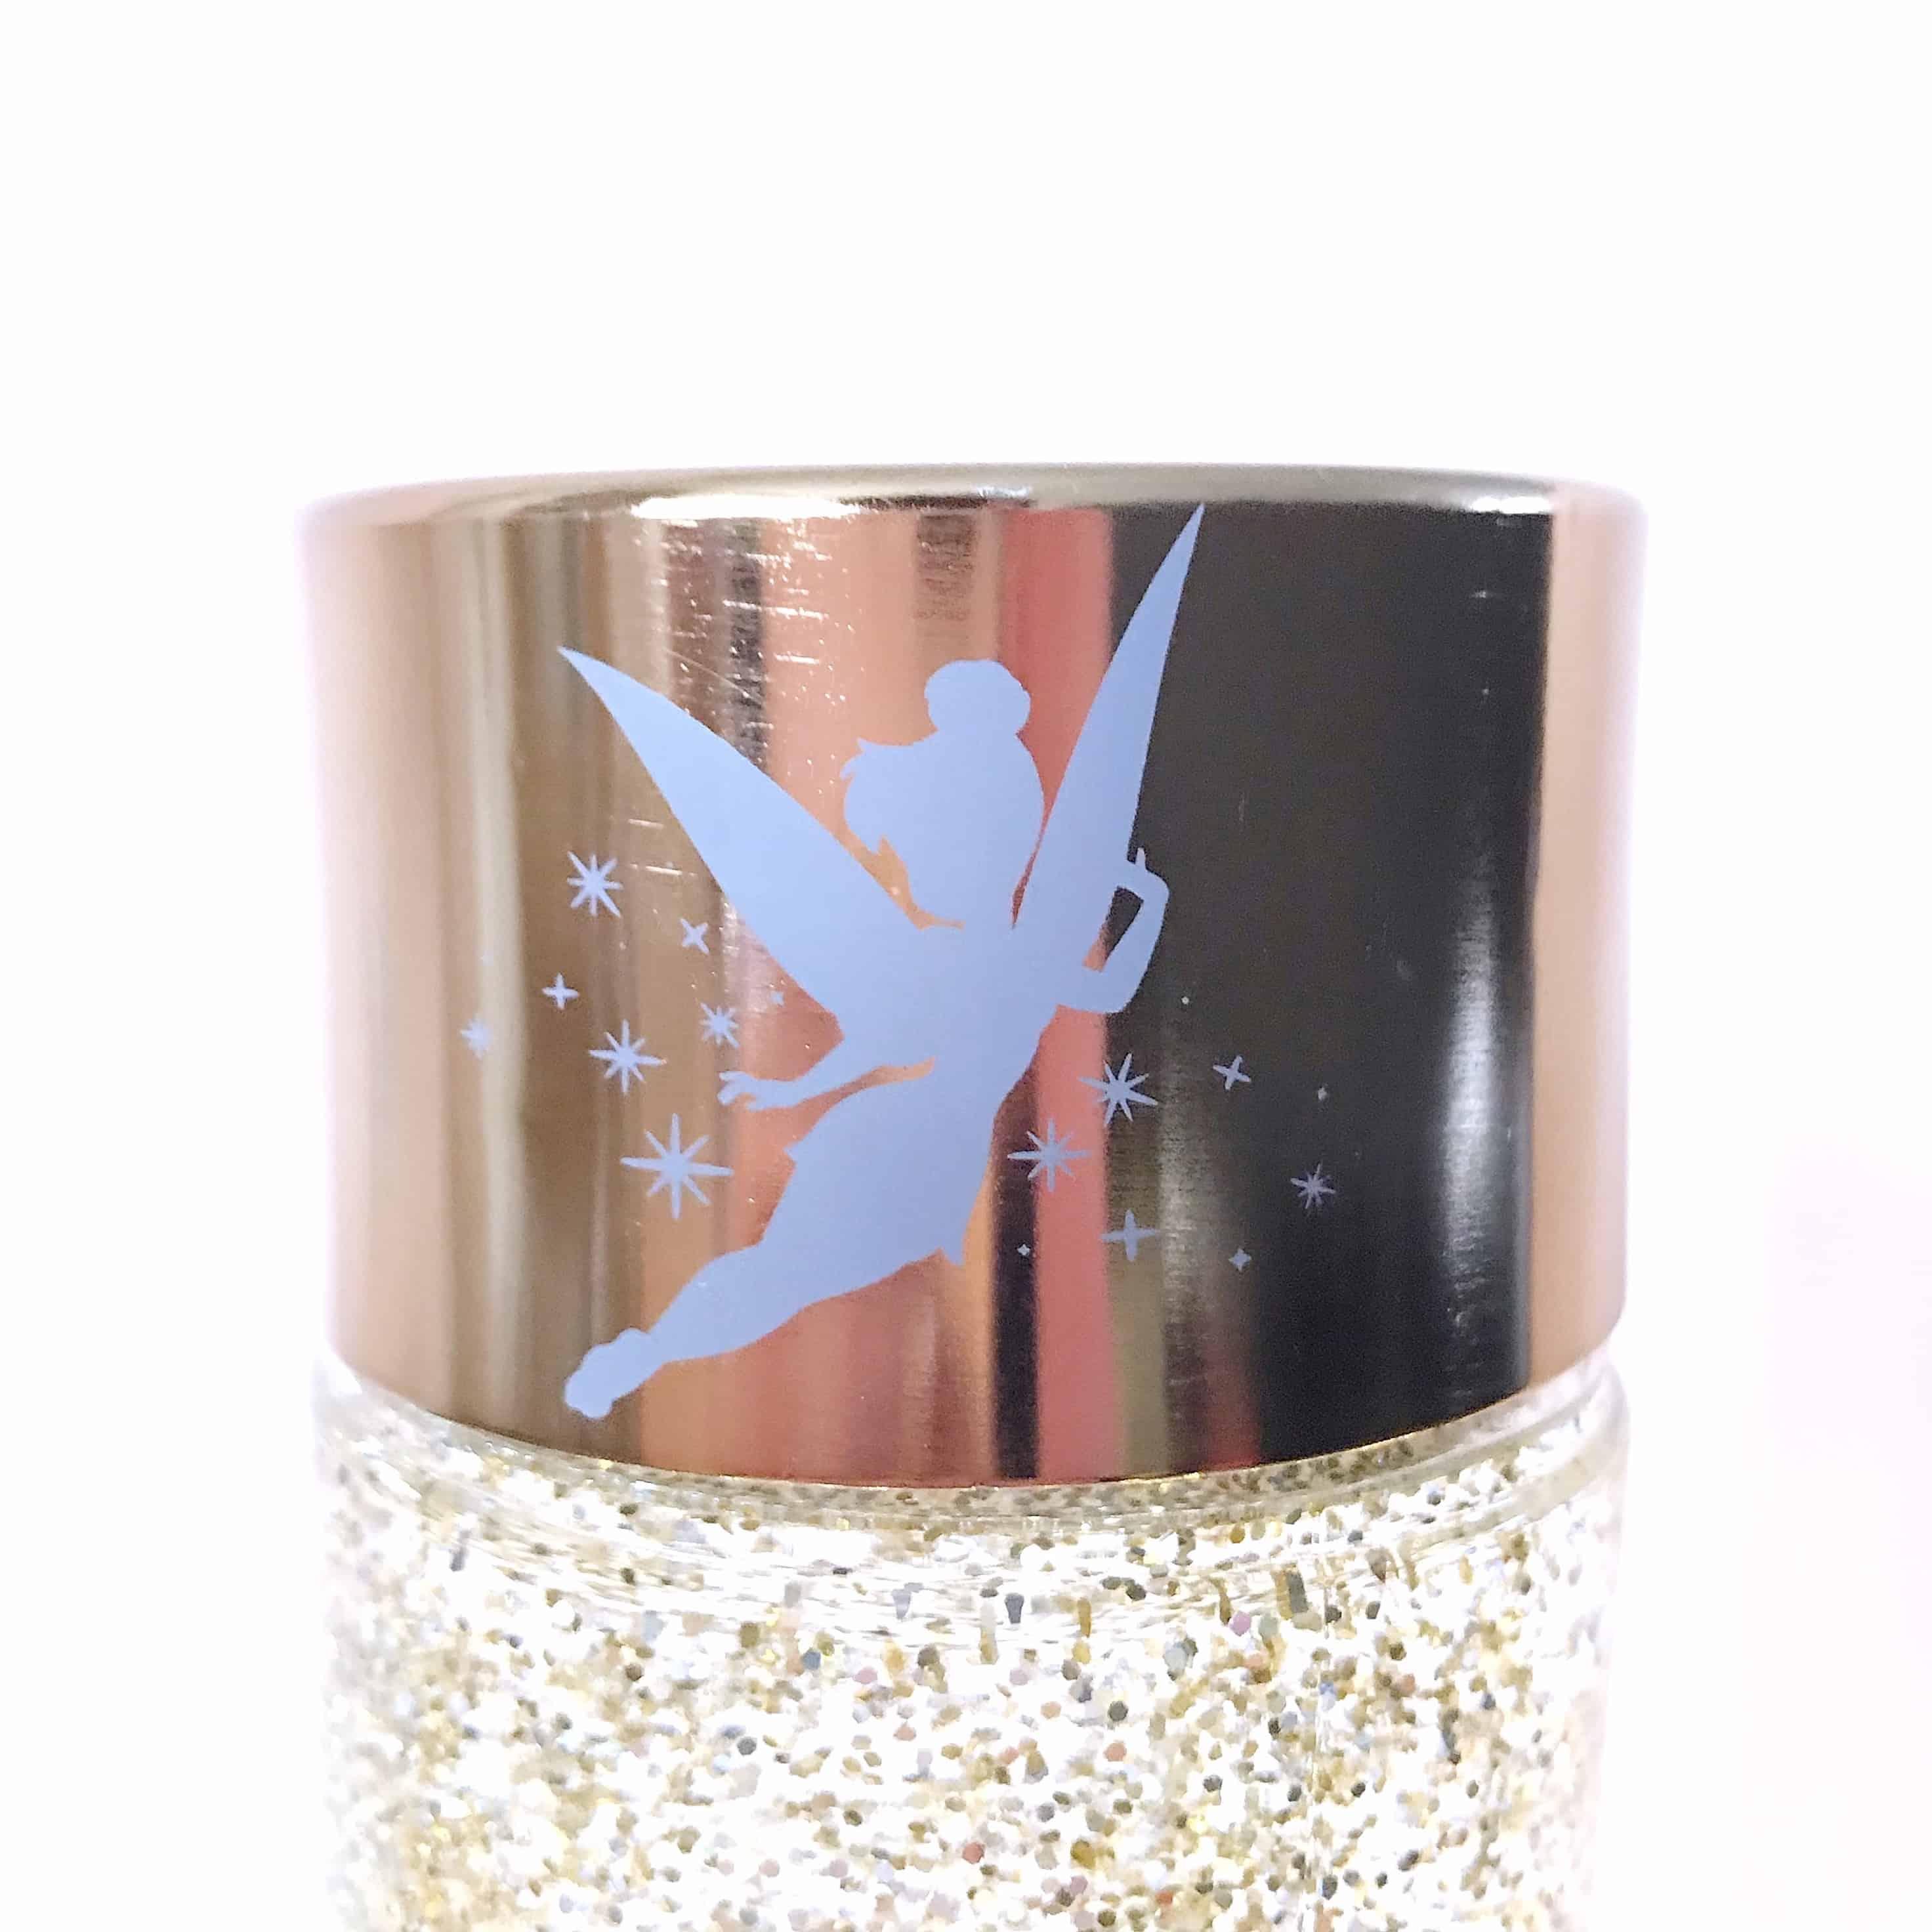 Tinkerbell motif on glitter lamp